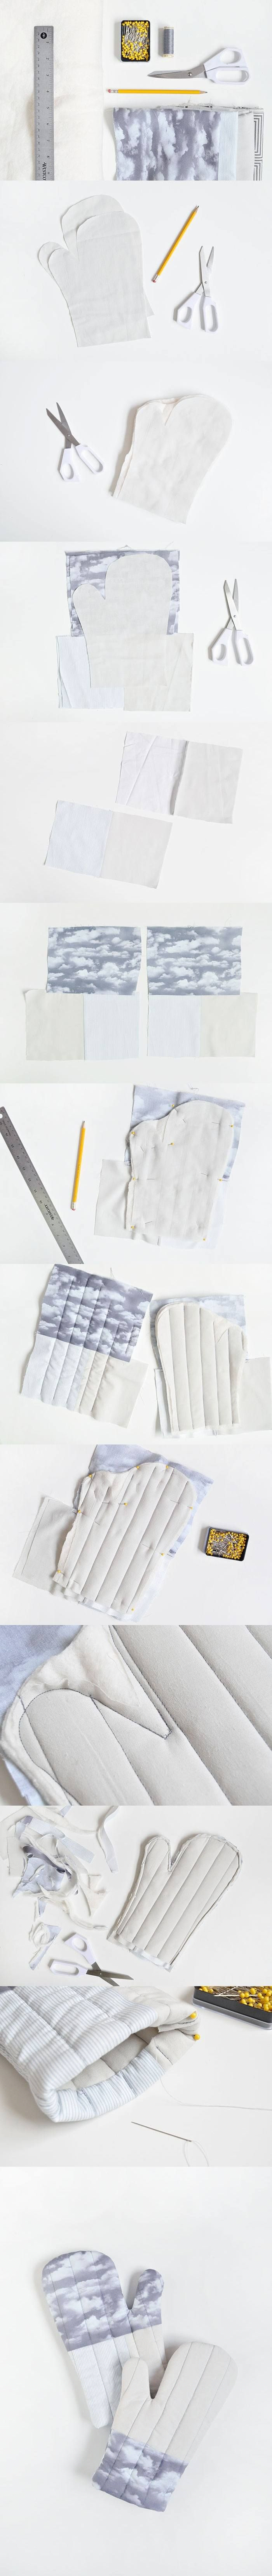 ¡Fabricas tus guantes de cocina! - Muy Ingenioso